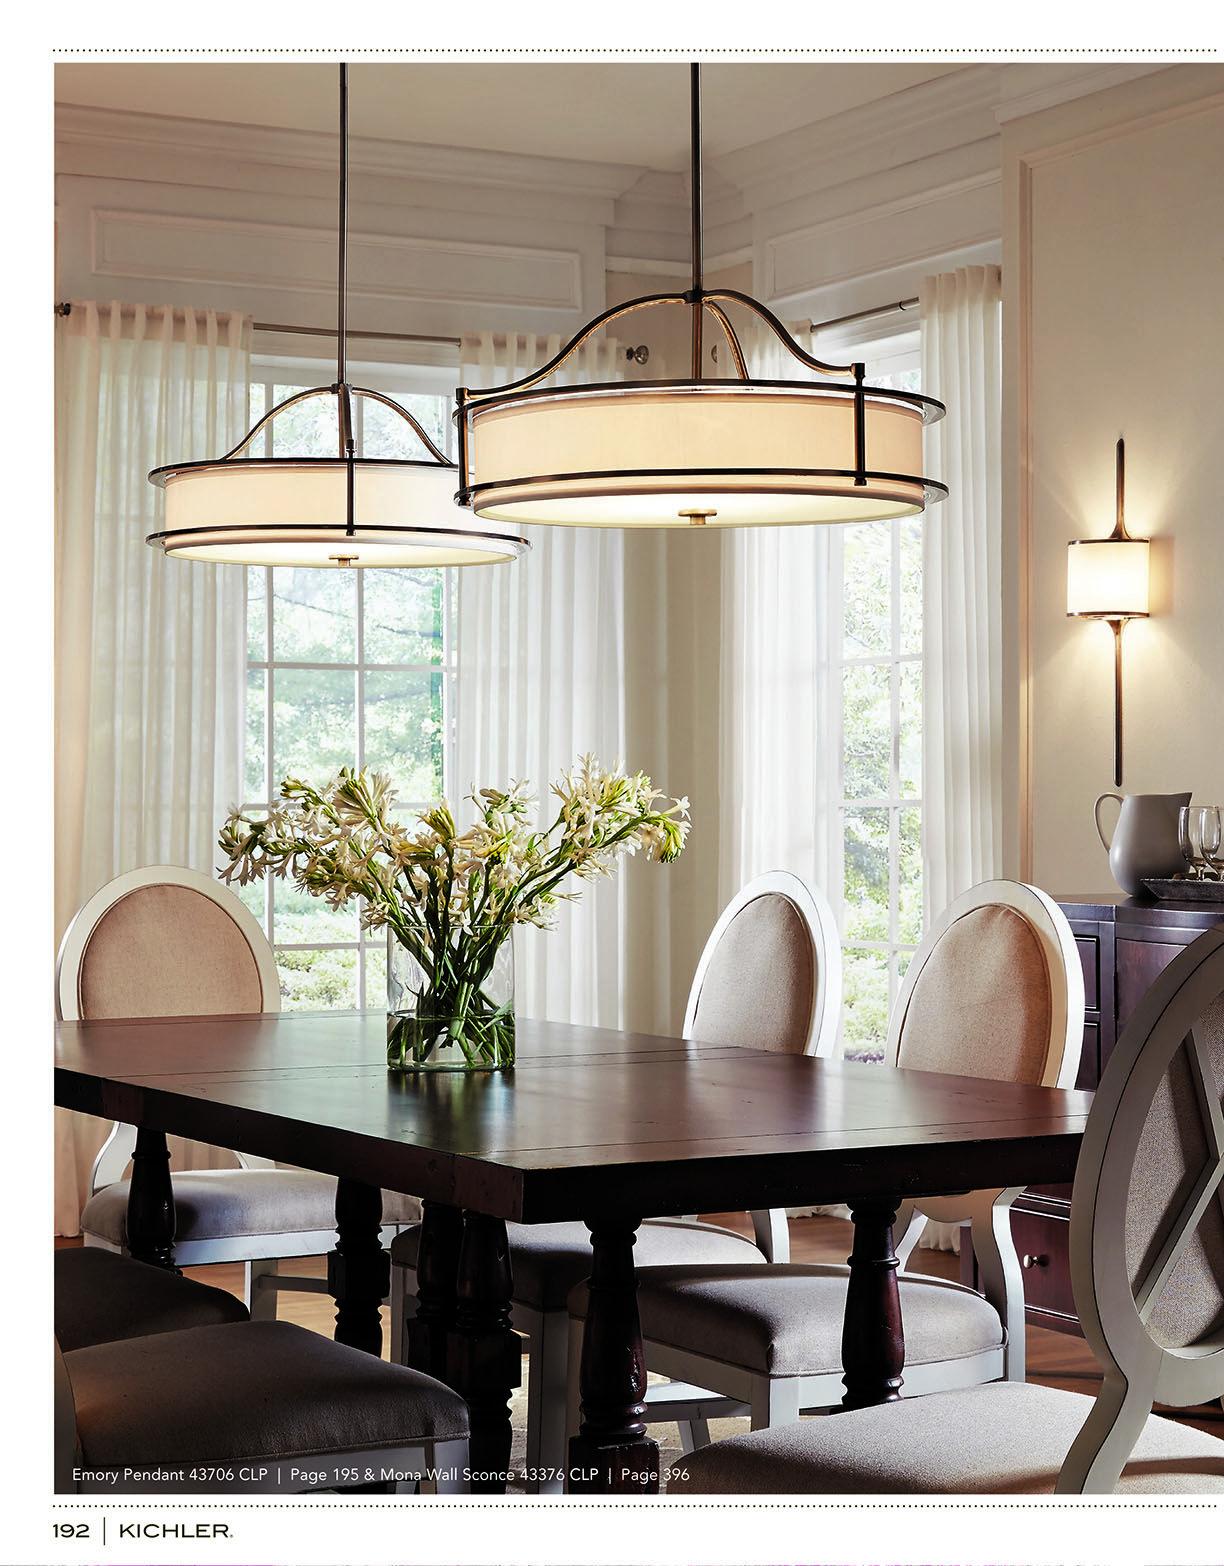 Kichler K116 Source Book Dining Room Light Fixtures